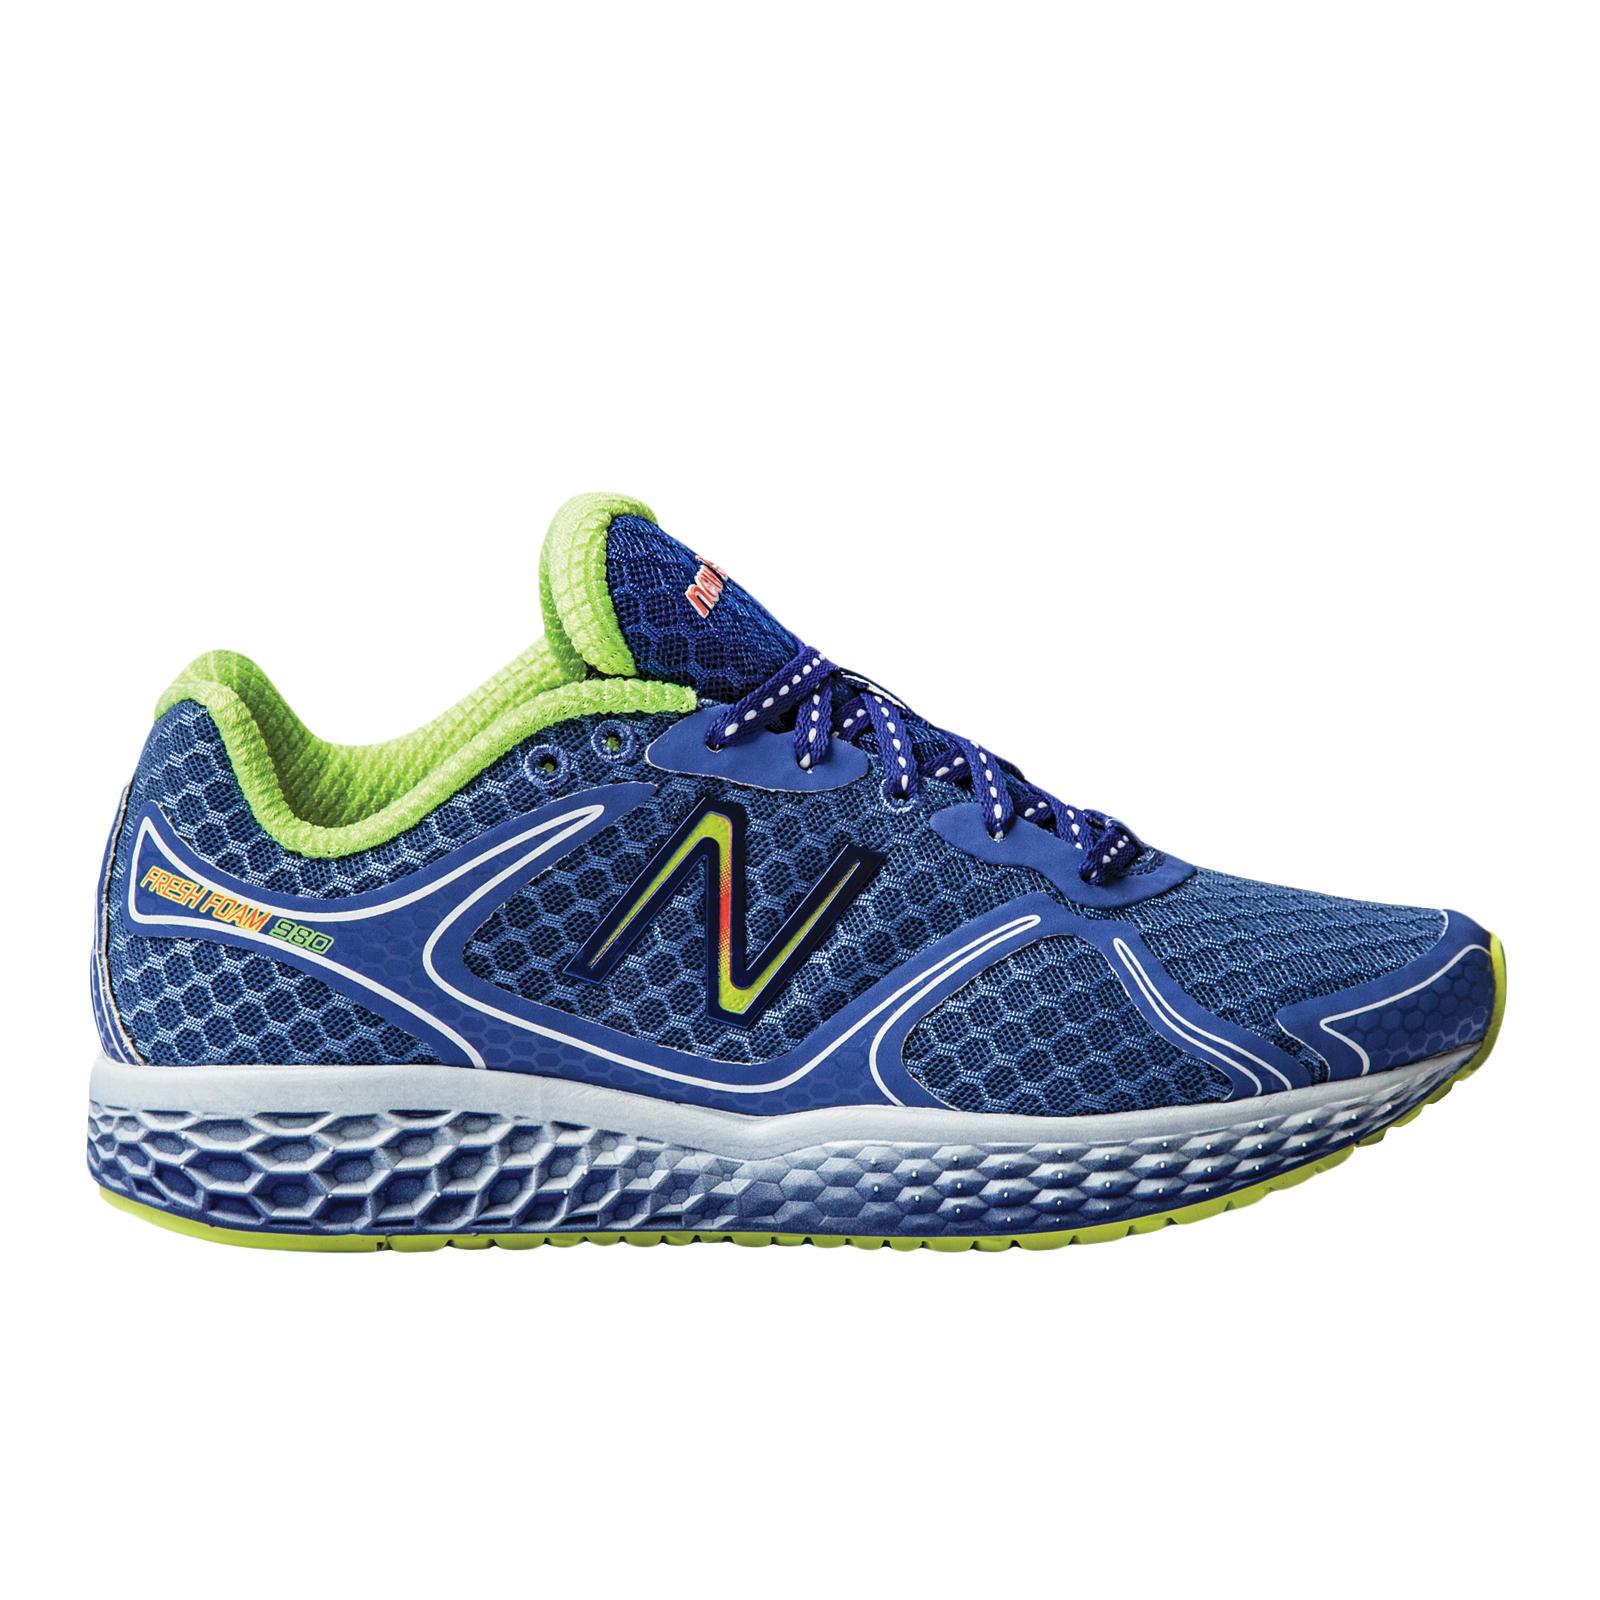 new balance tennis shoes australia